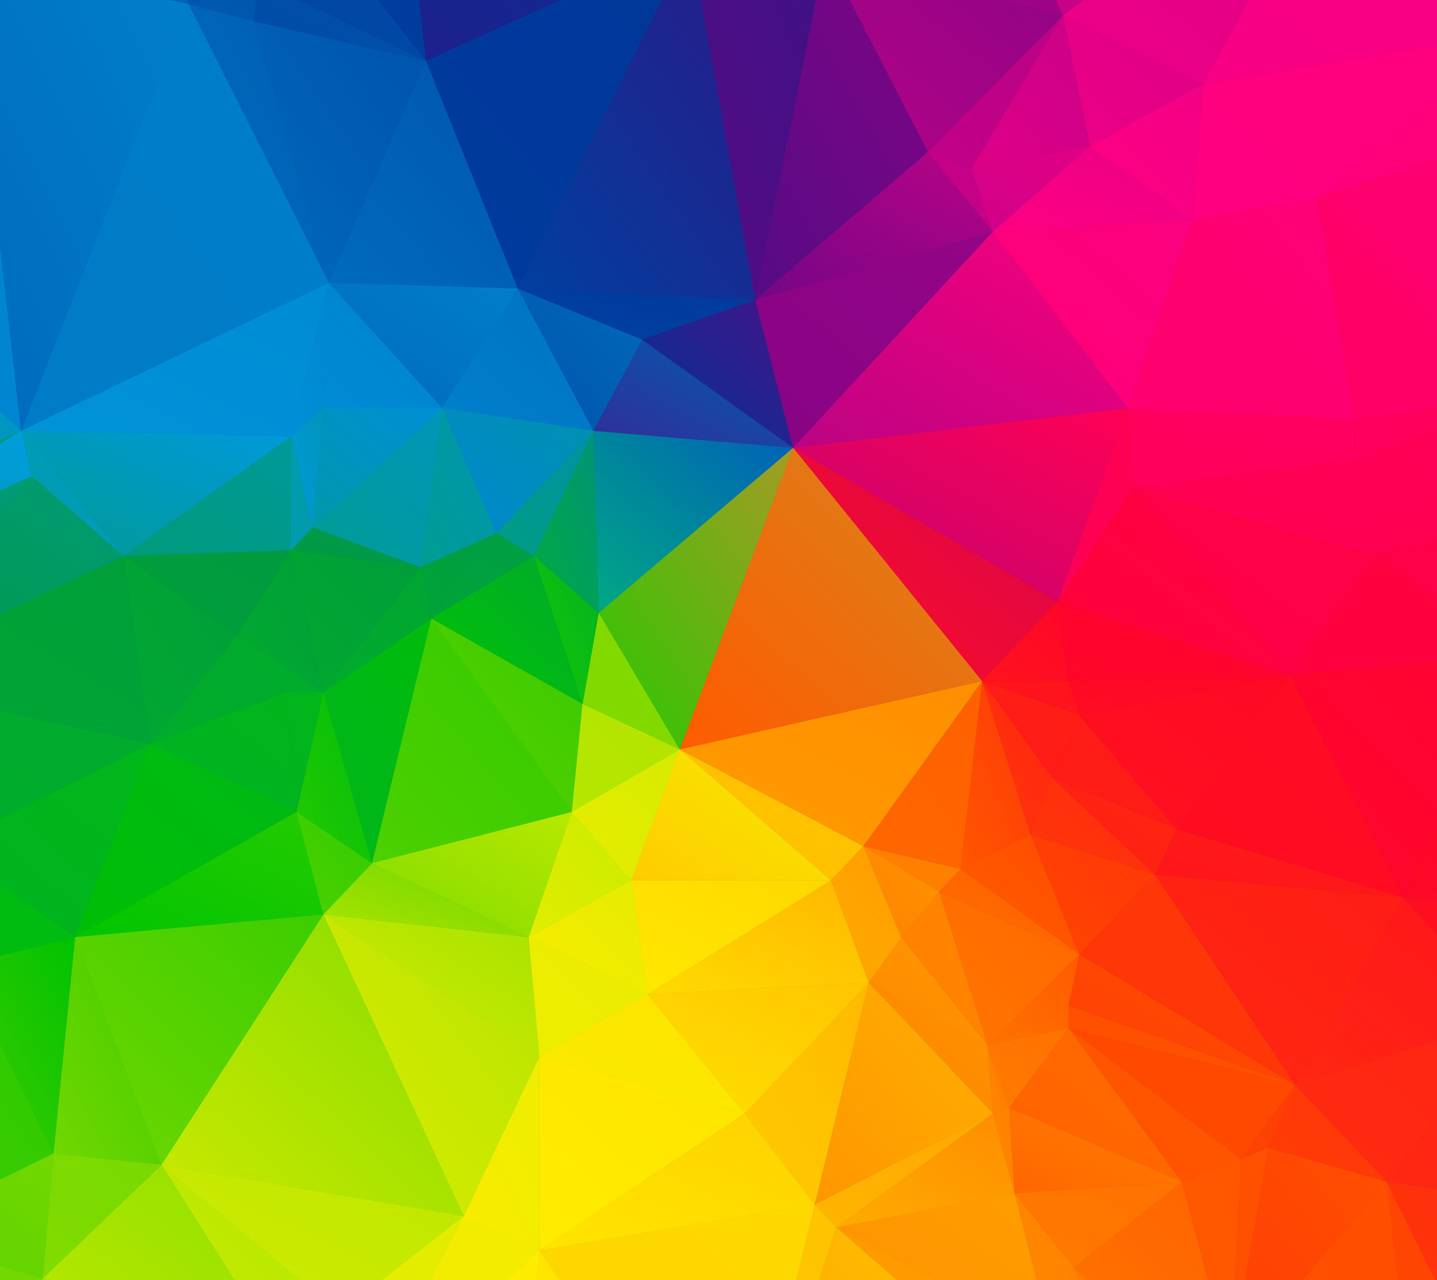 Rainbow Lowpoly